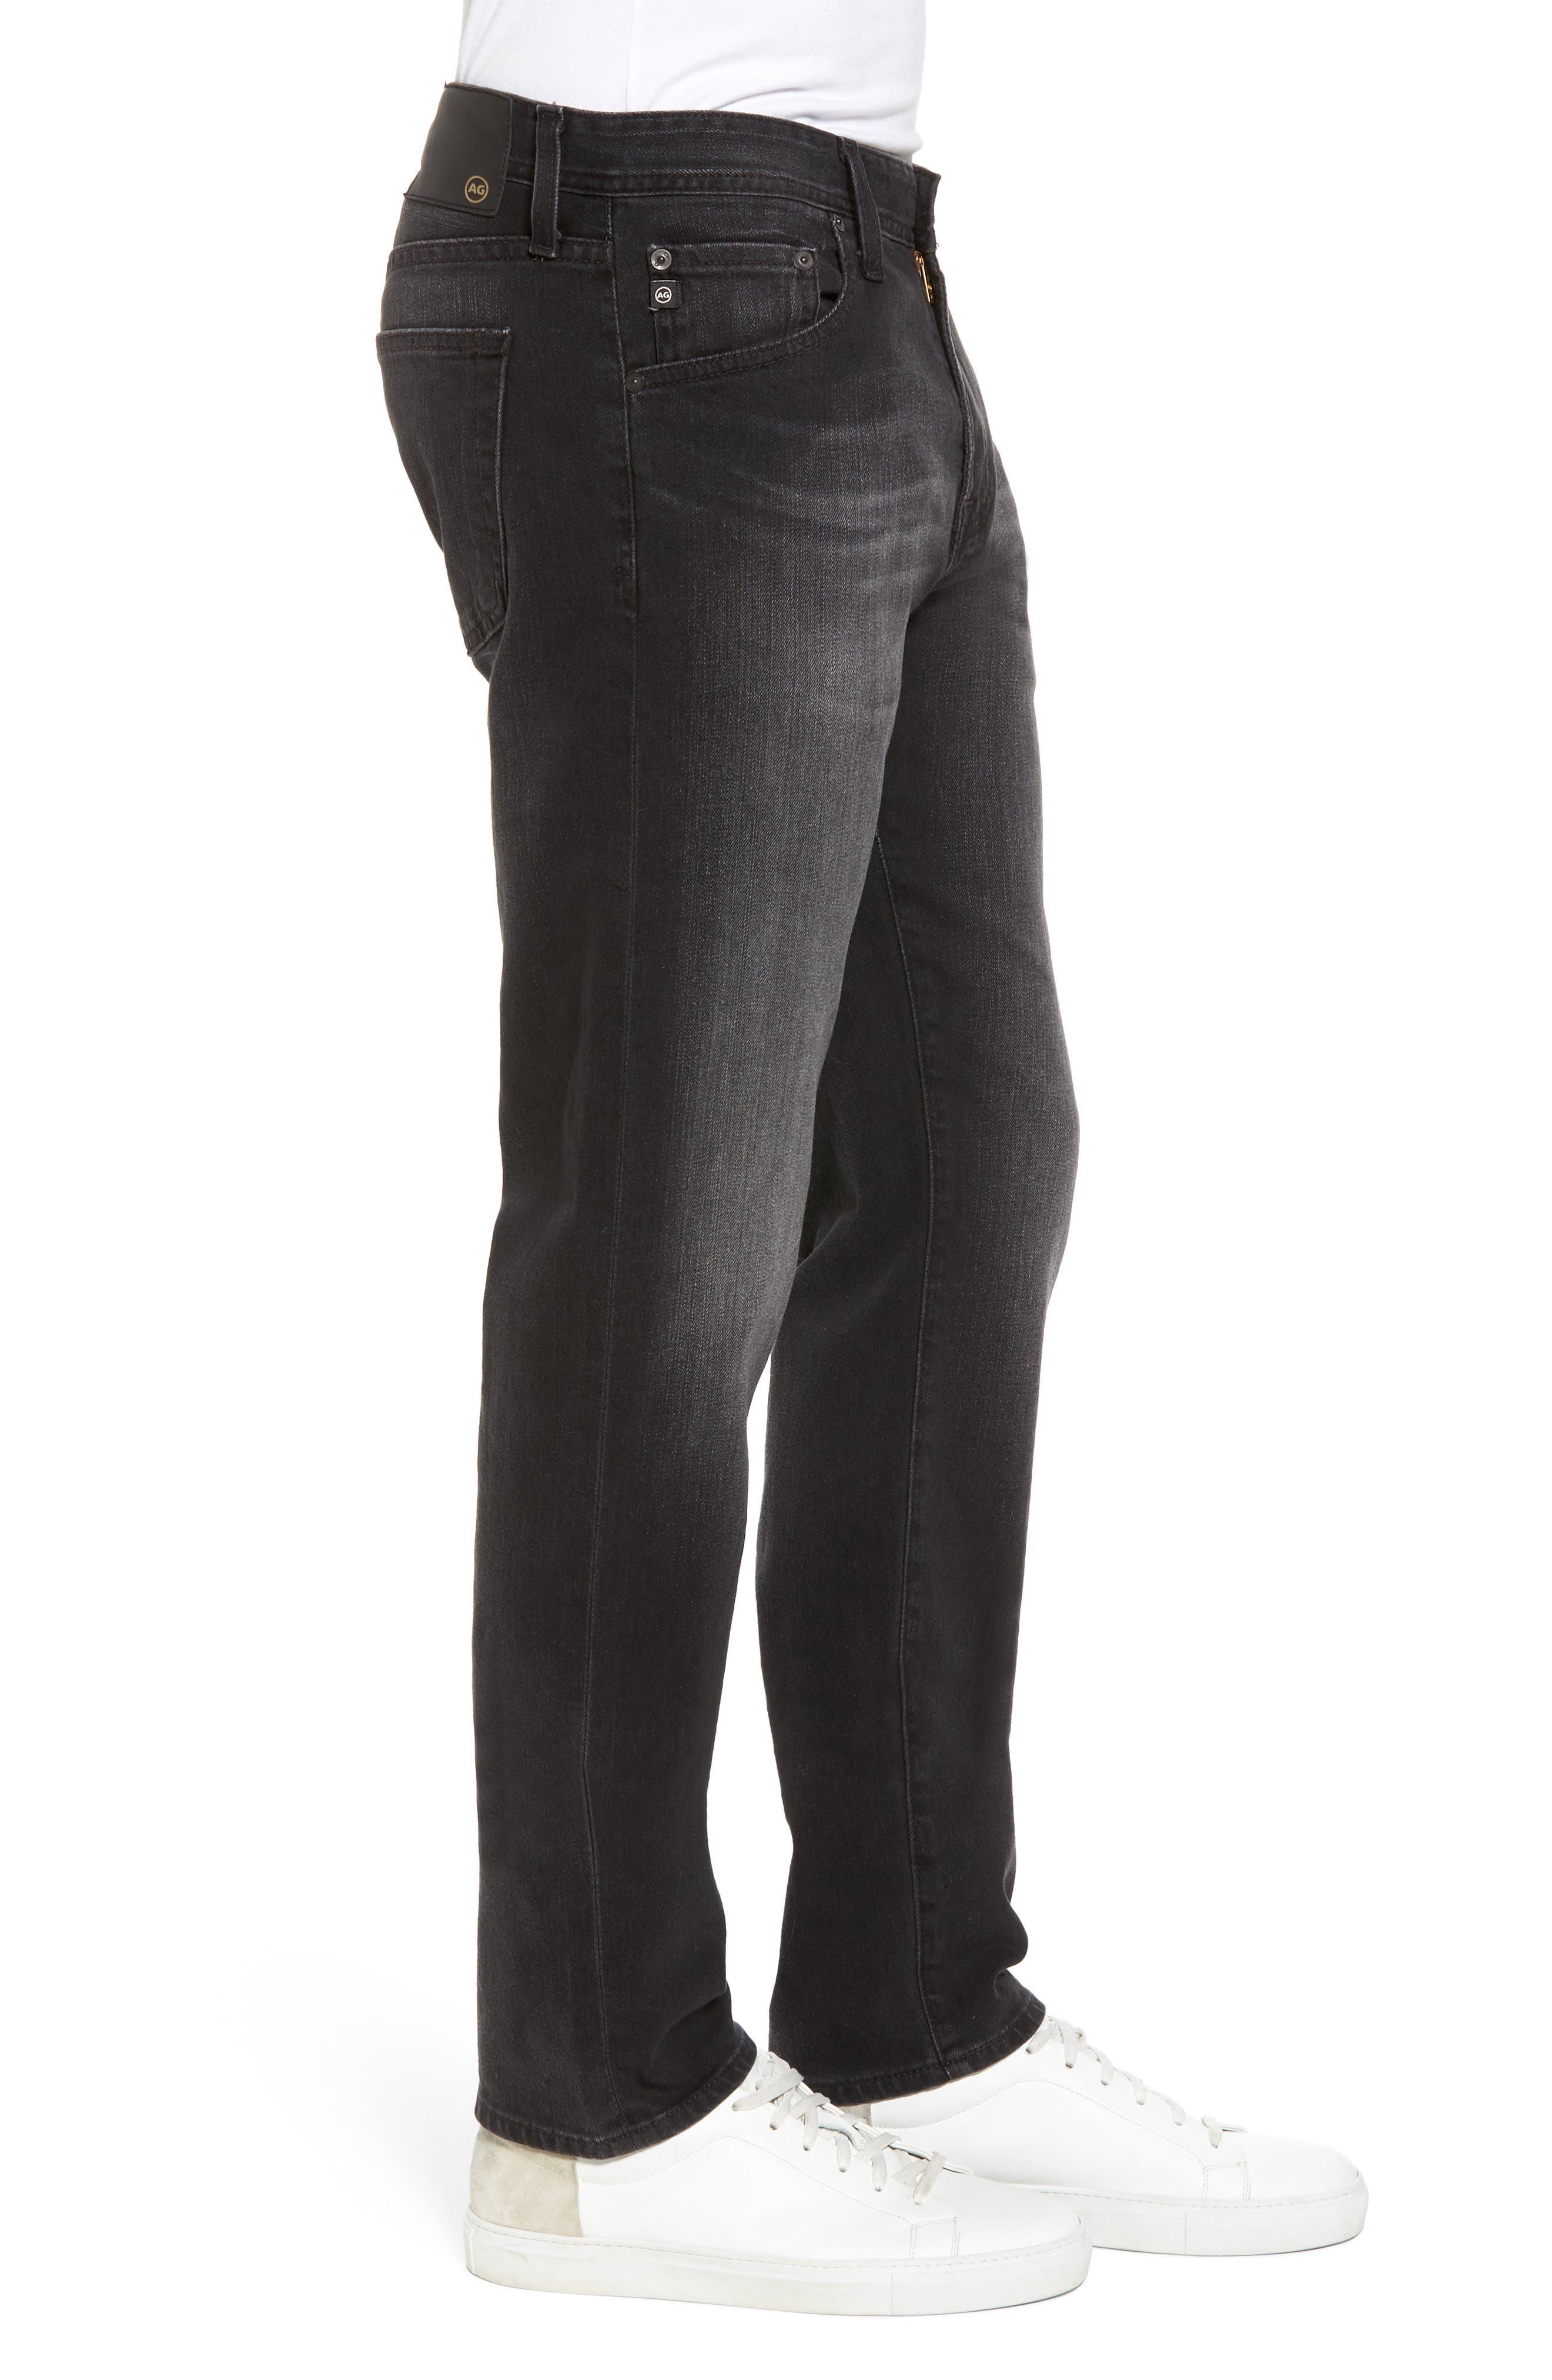 Tellis Modern Slim Fit Jeans,                             Alternate thumbnail 3, color,                             Smudged Black